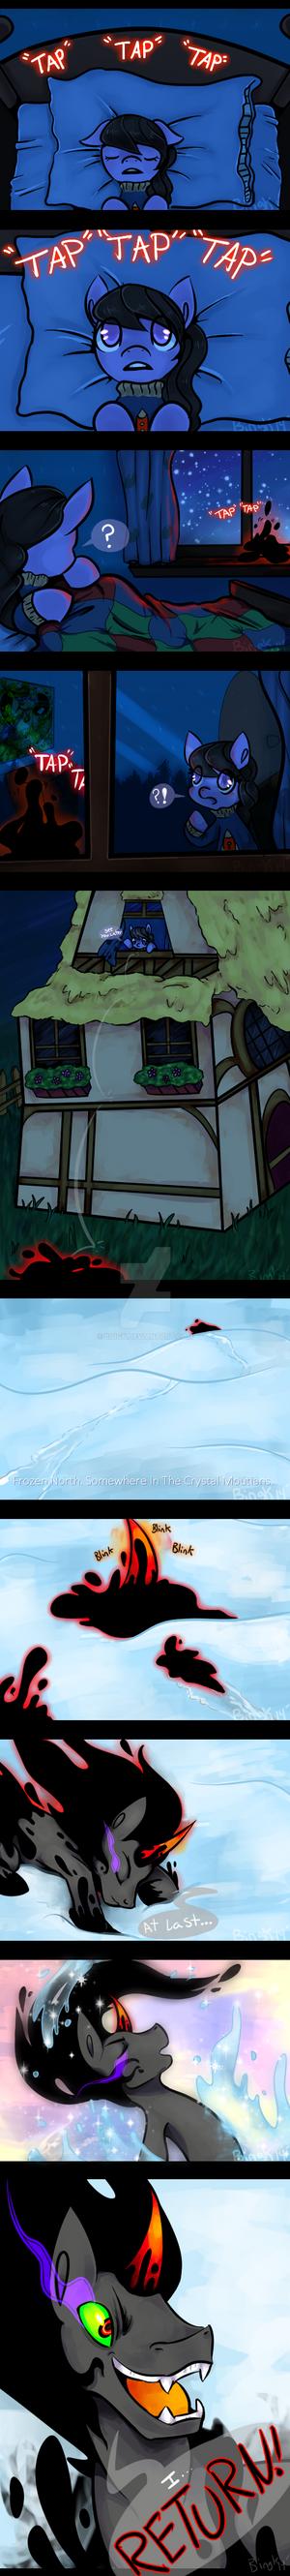 Sombras return by Bingk